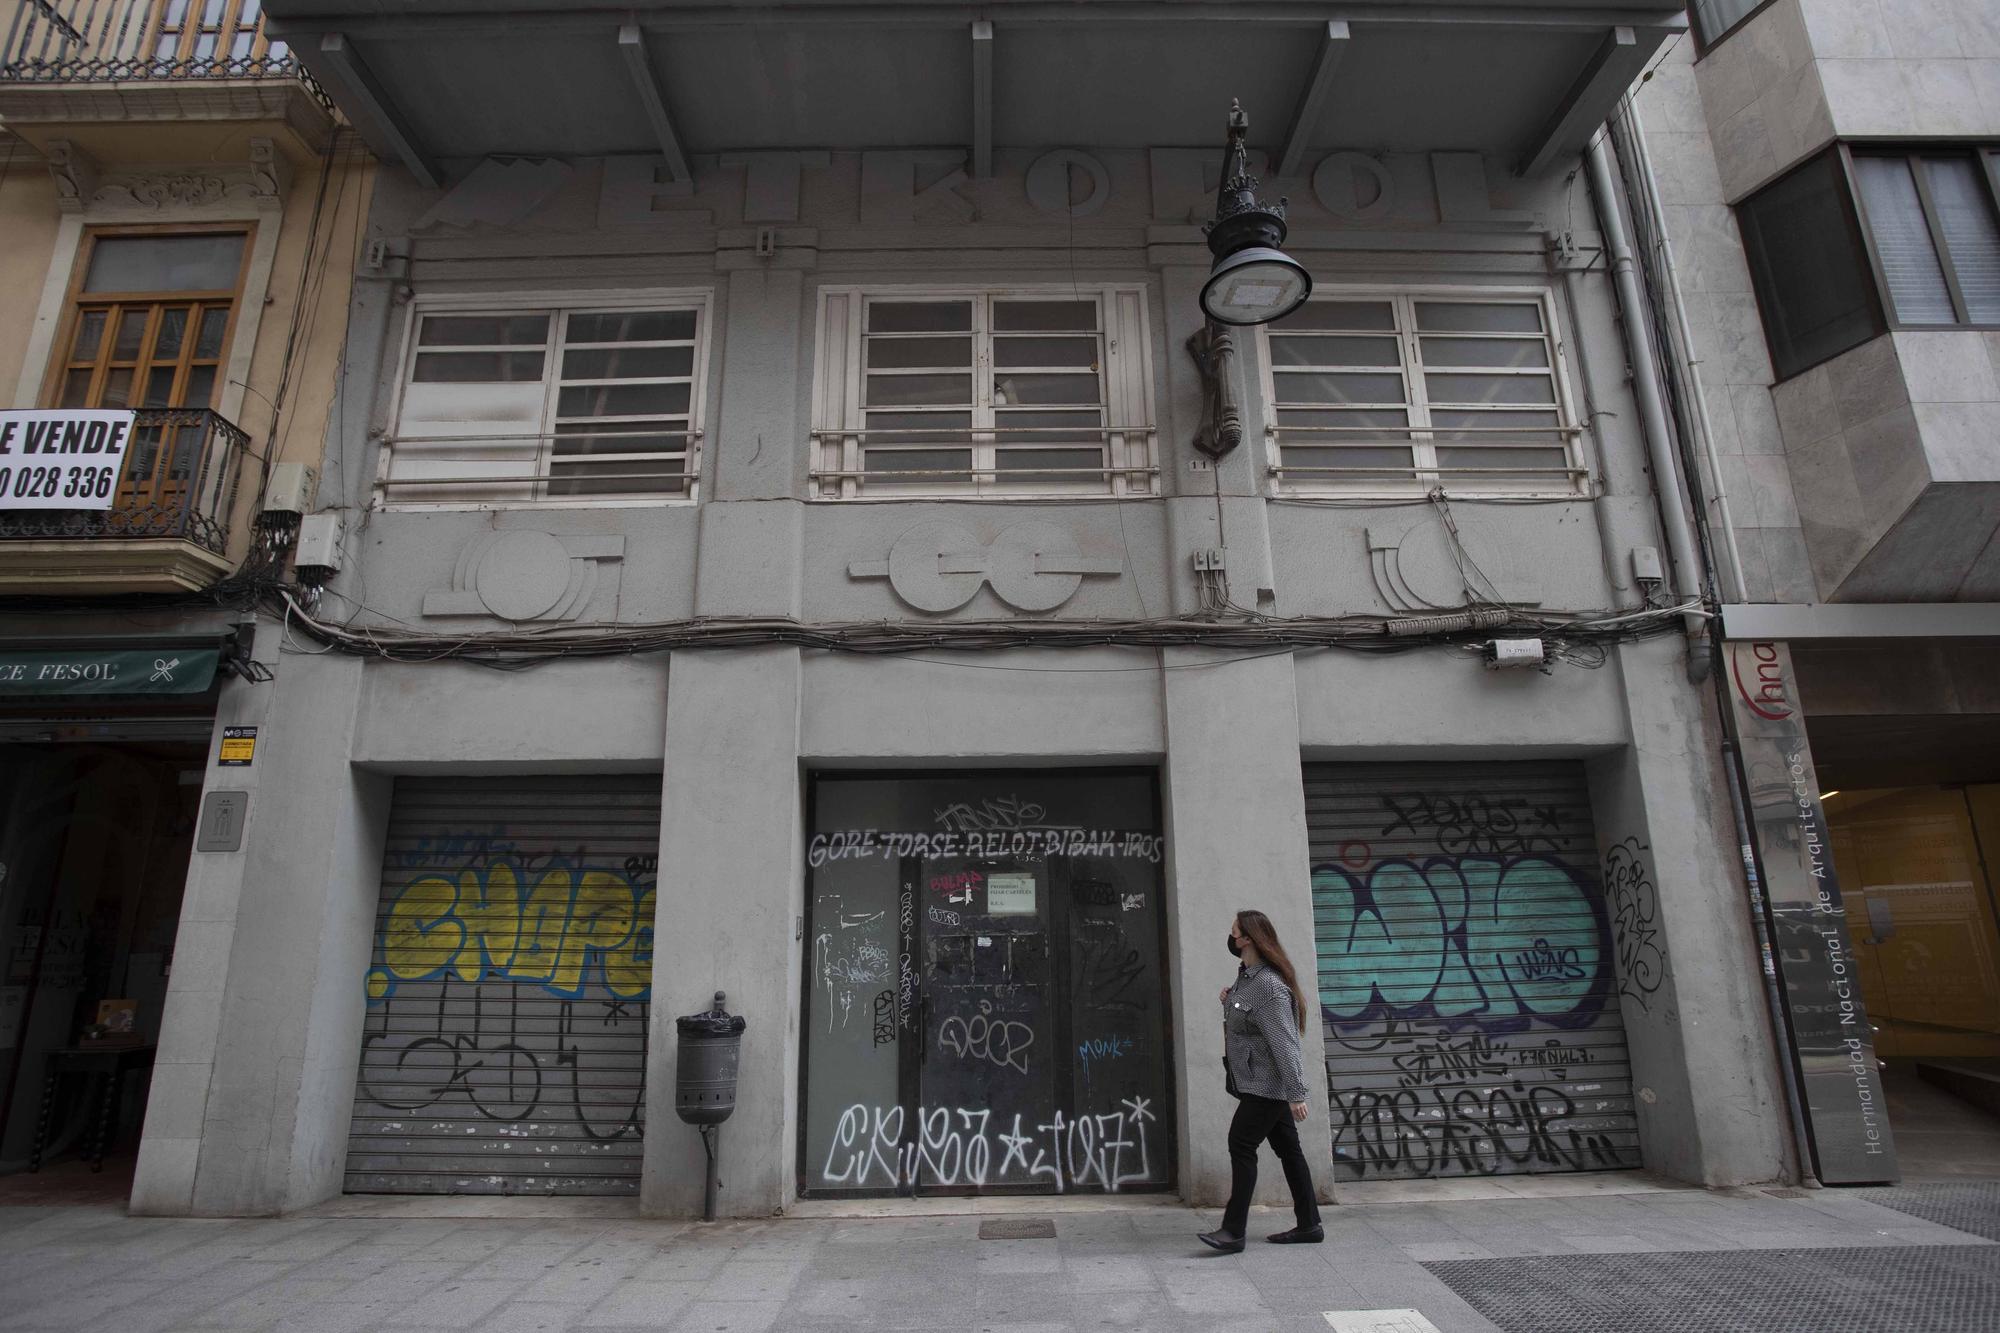 ¿Adiós al edificio del Cine Metropol?